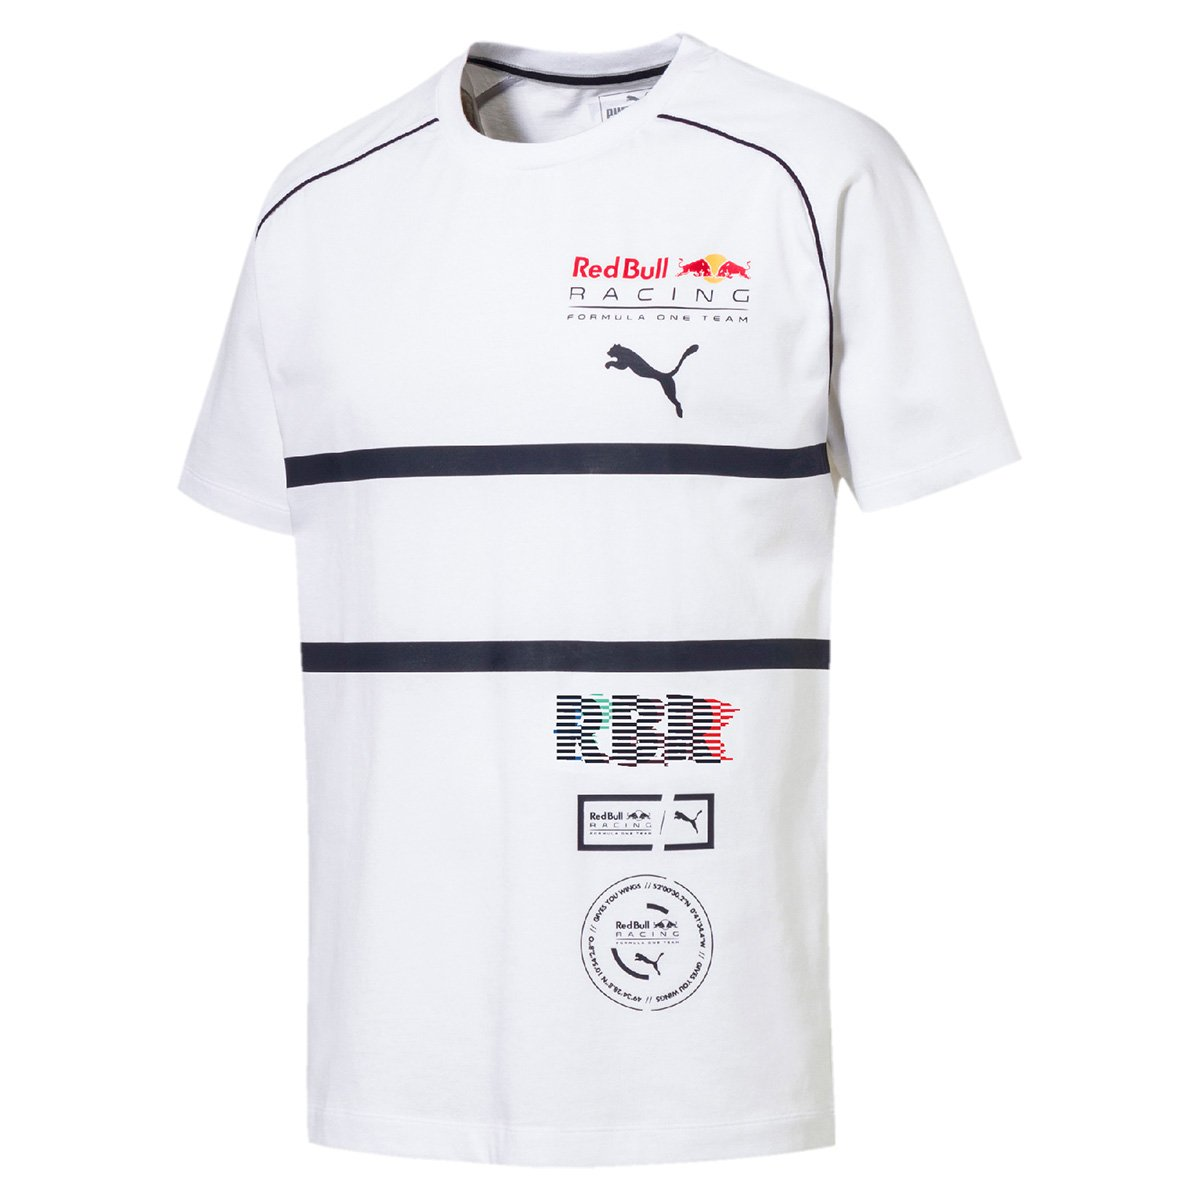 4e34dbdc80ed9 Camiseta Puma Red Bull Racing Speedcat Evo Tee Masculina - Branco - Compre  Agora